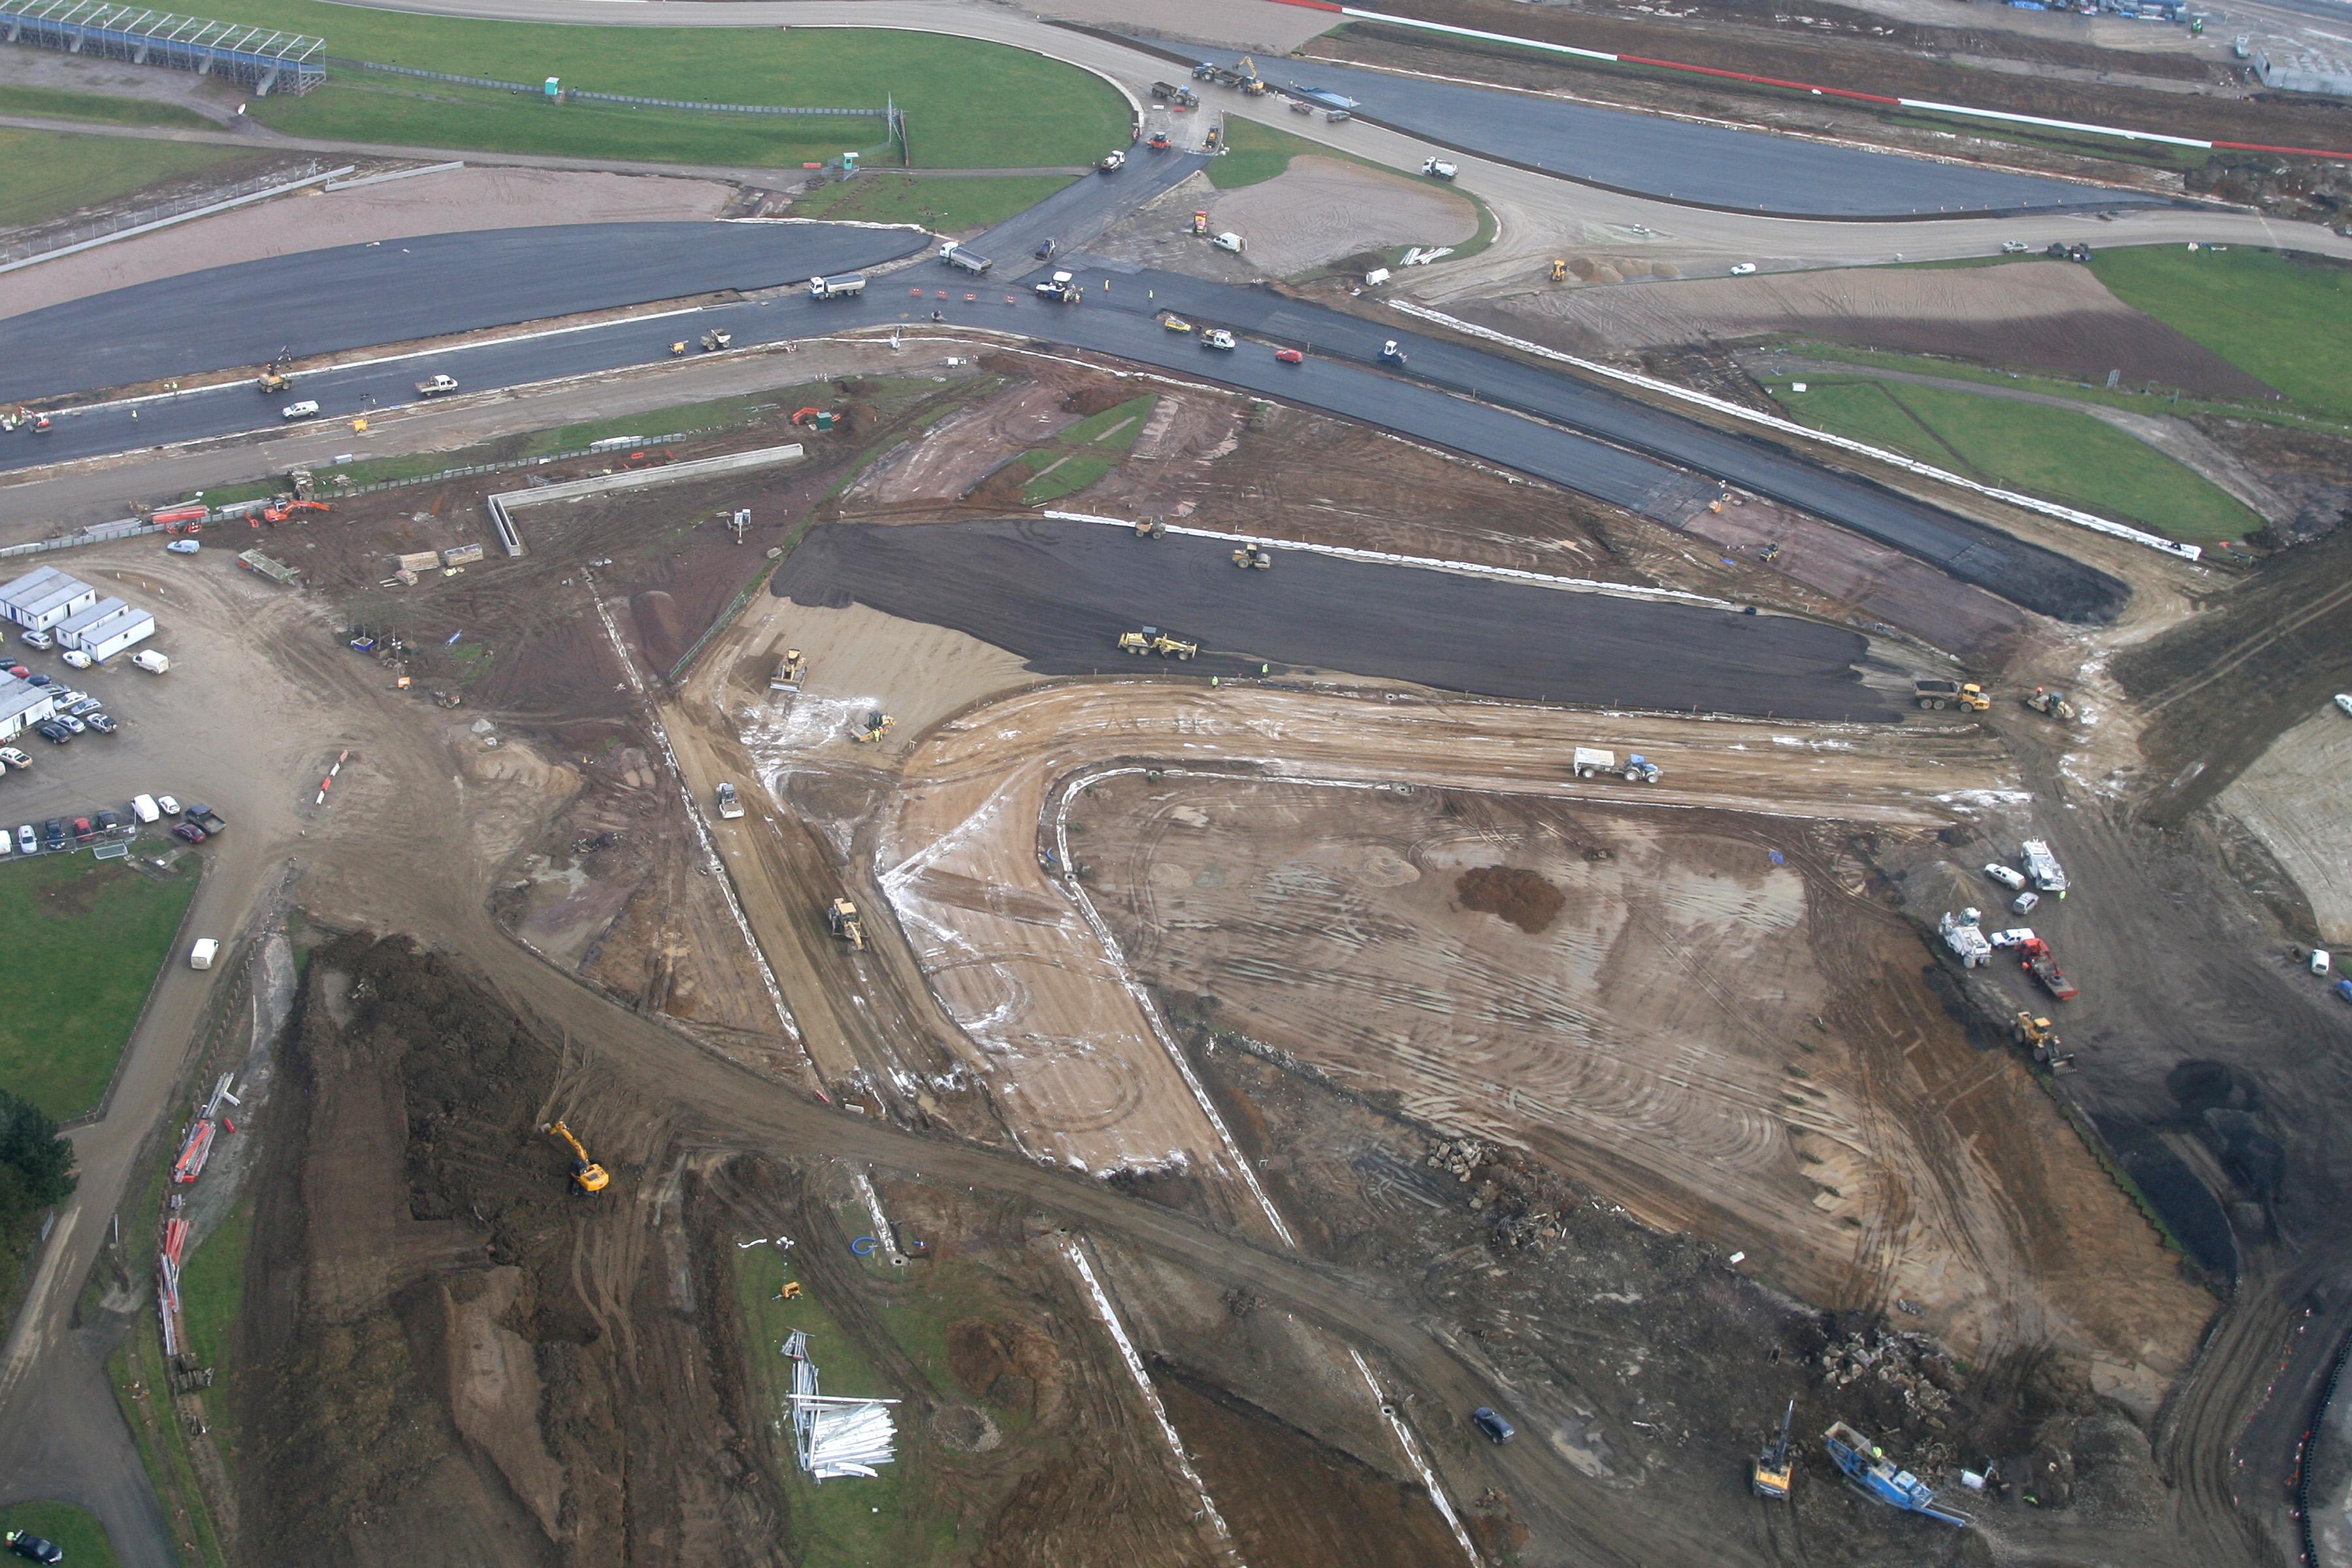 British GP to use new Silverstone layout | joeblogsf1